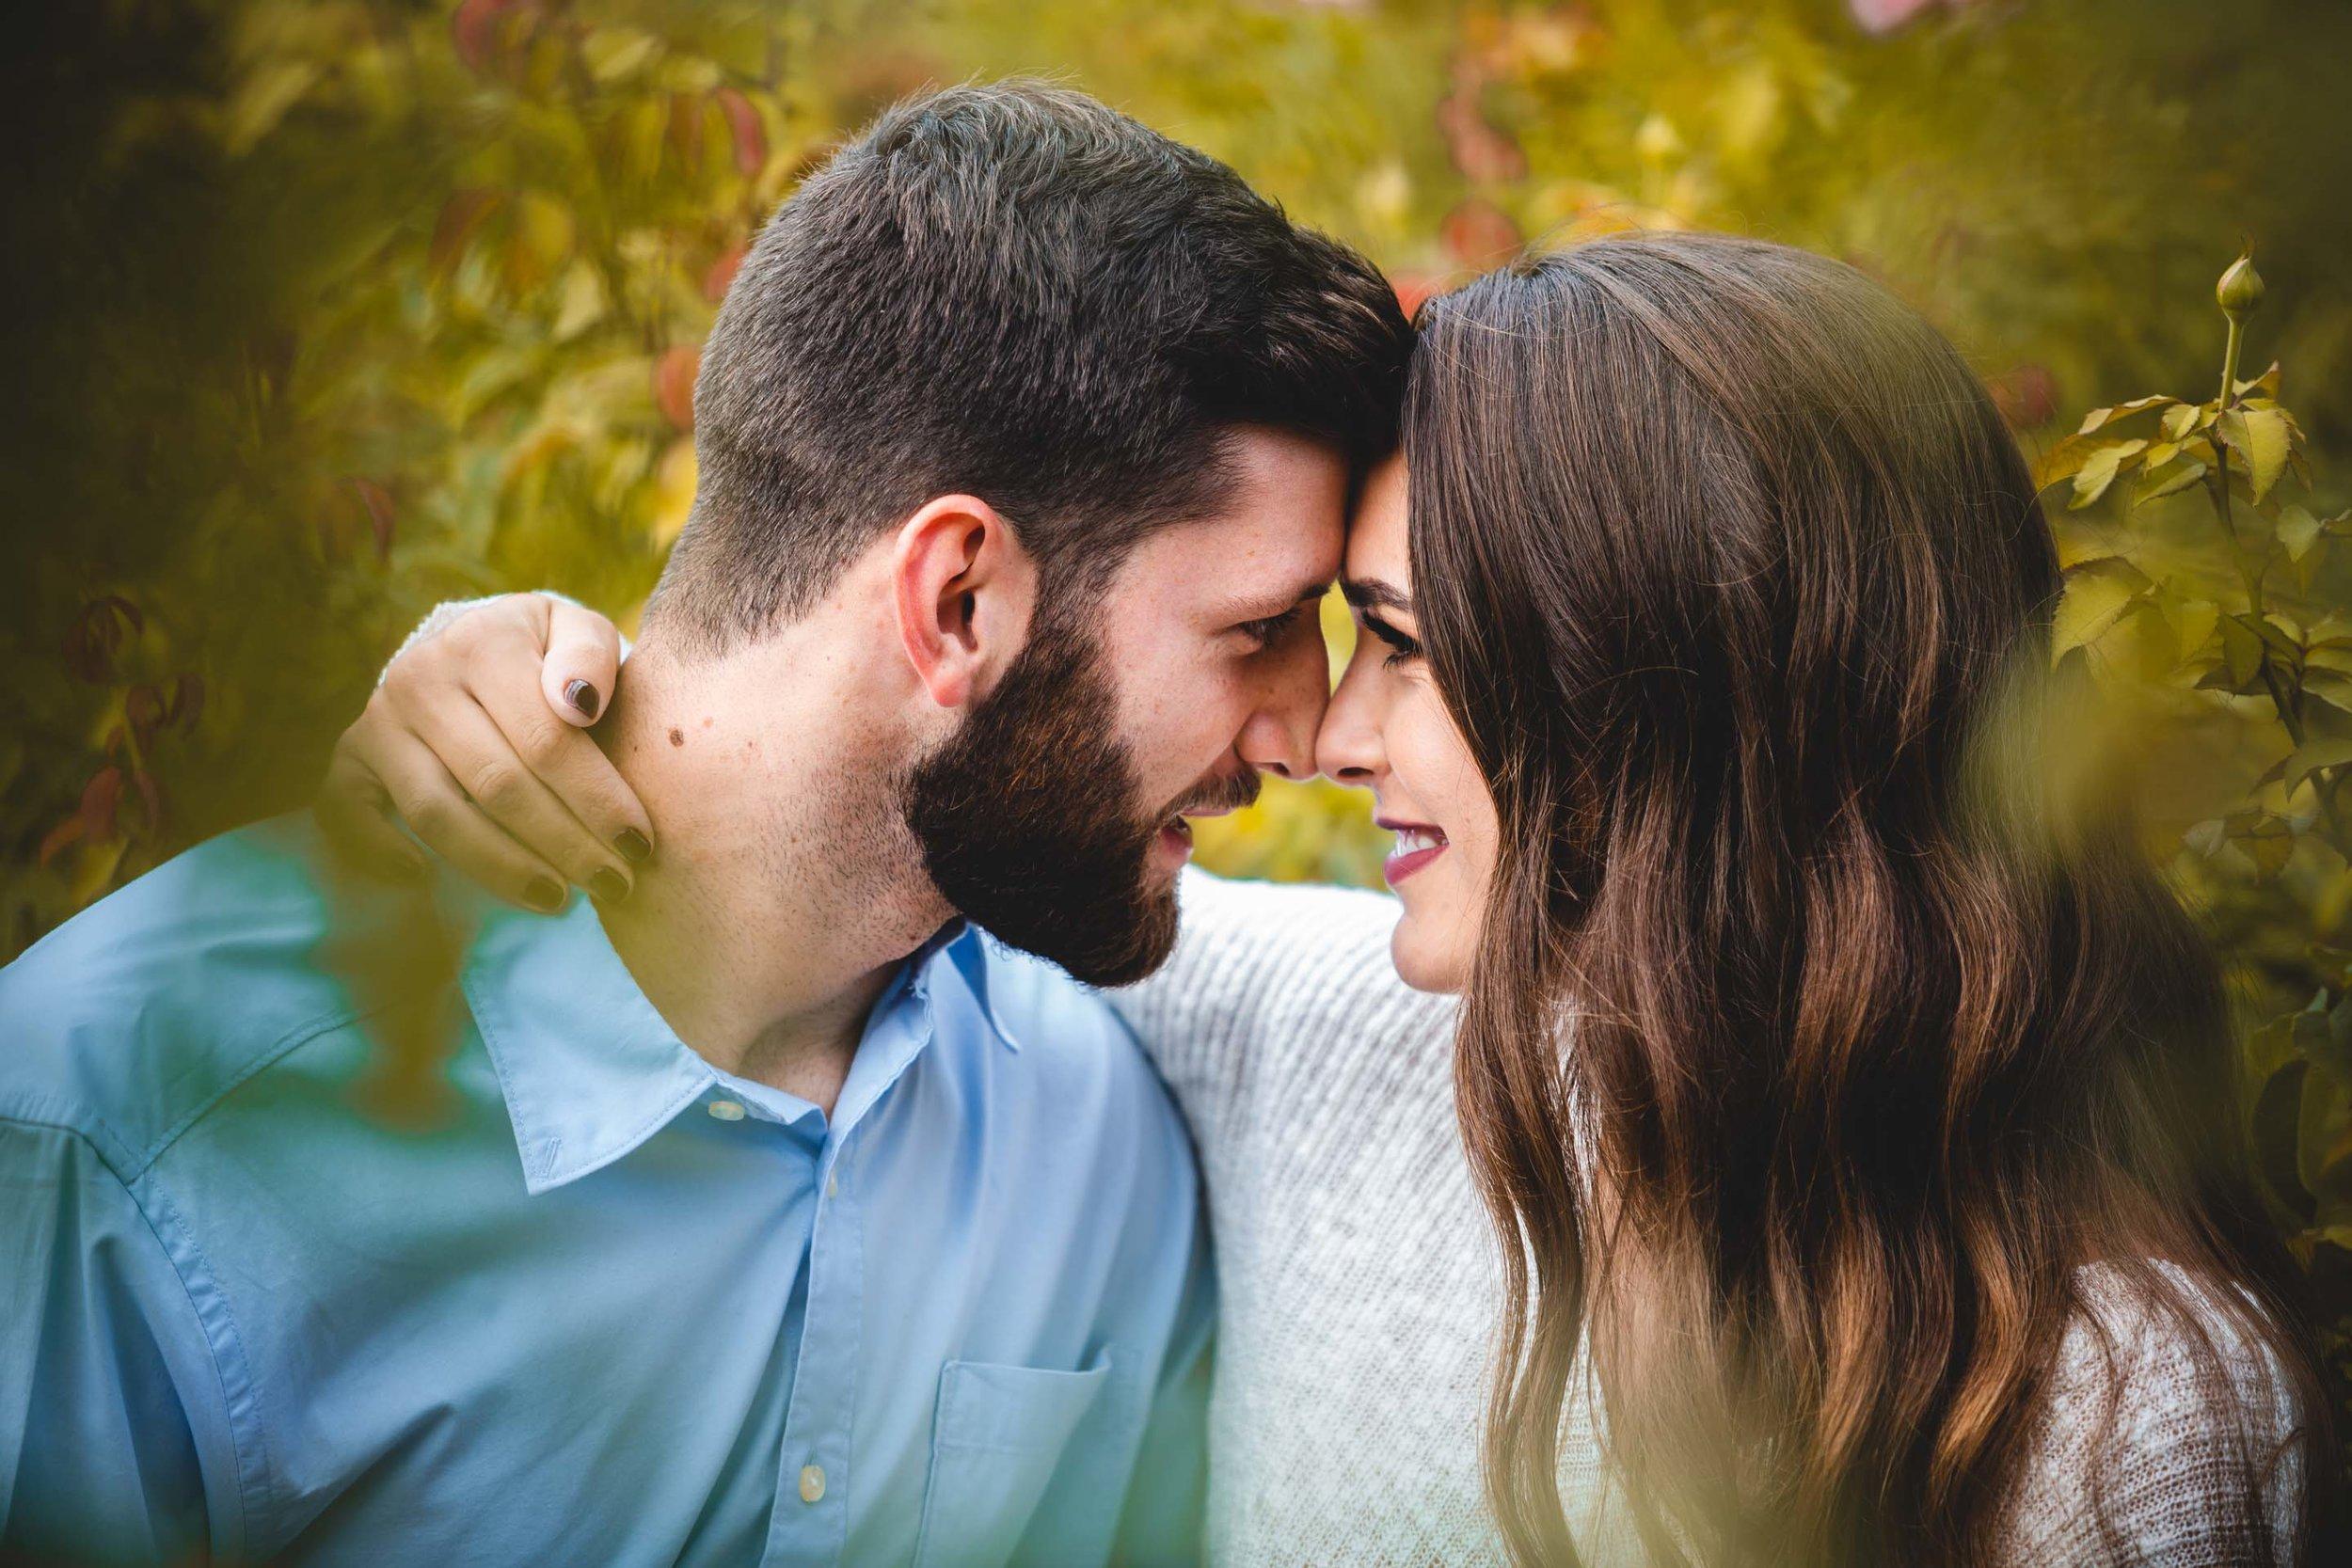 adam-szarmack-jacksonville-wedding-photographer-palm-coast-washing-oaks-garden-state-park-engagement-19.jpg